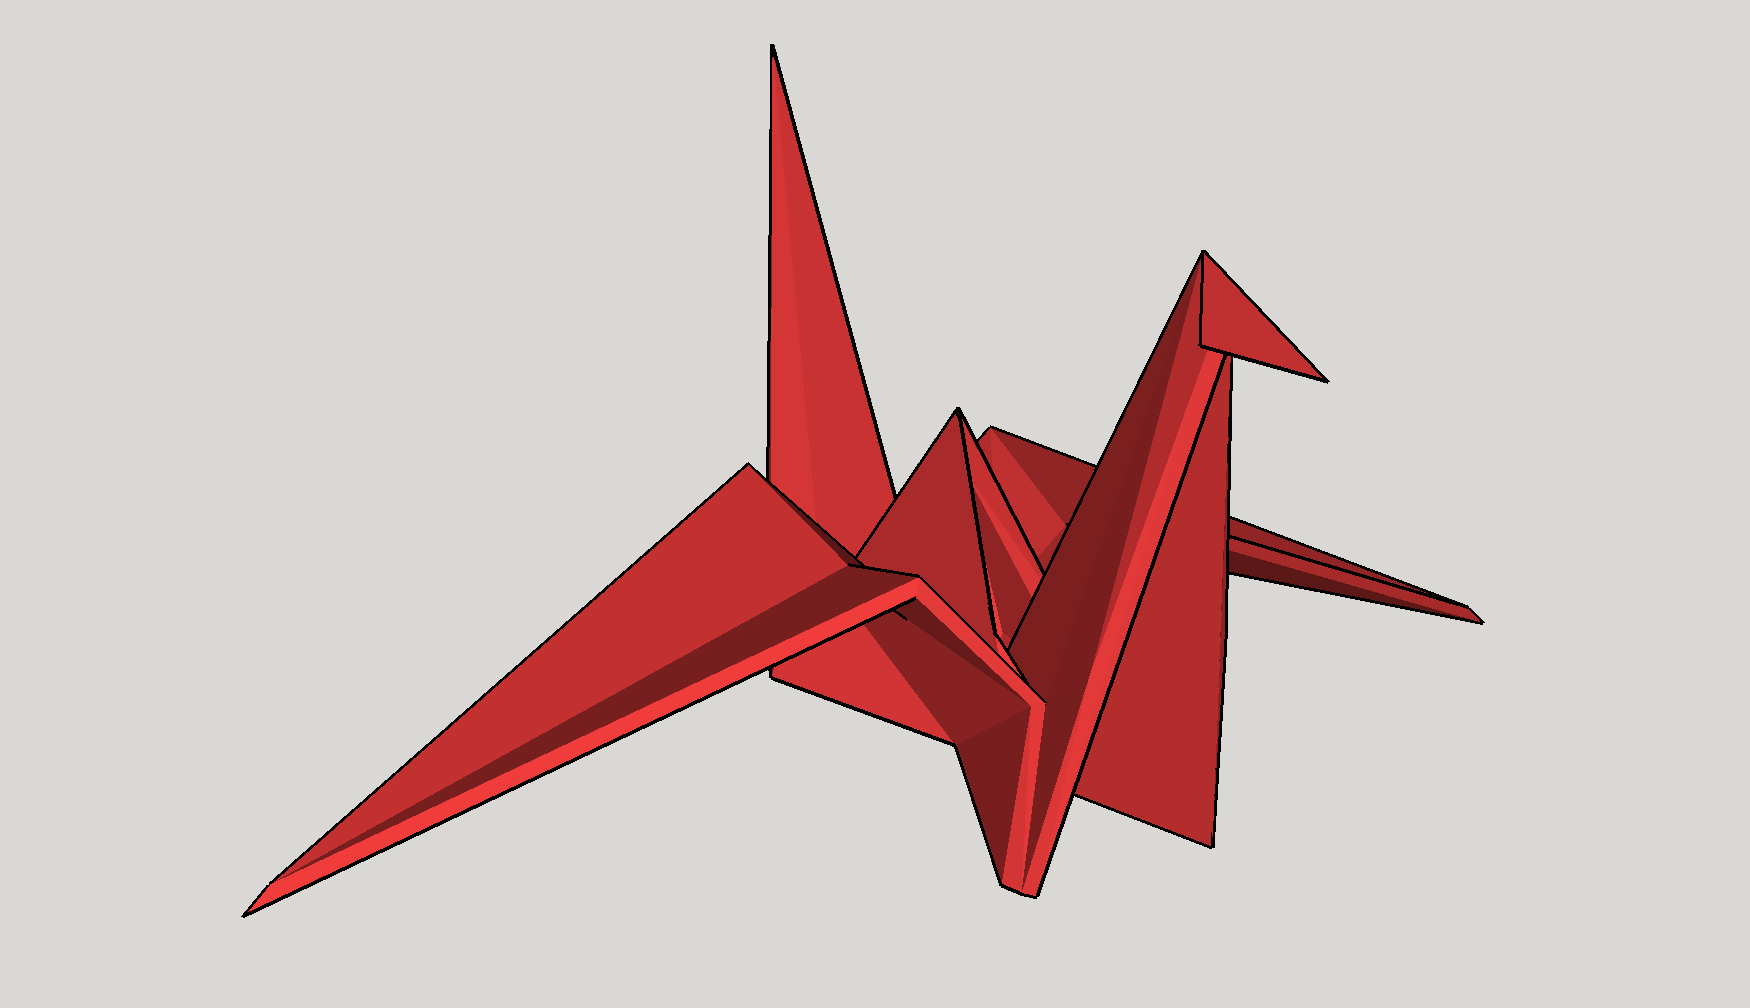 3D Printed Origami Crane By Wannesjanssens